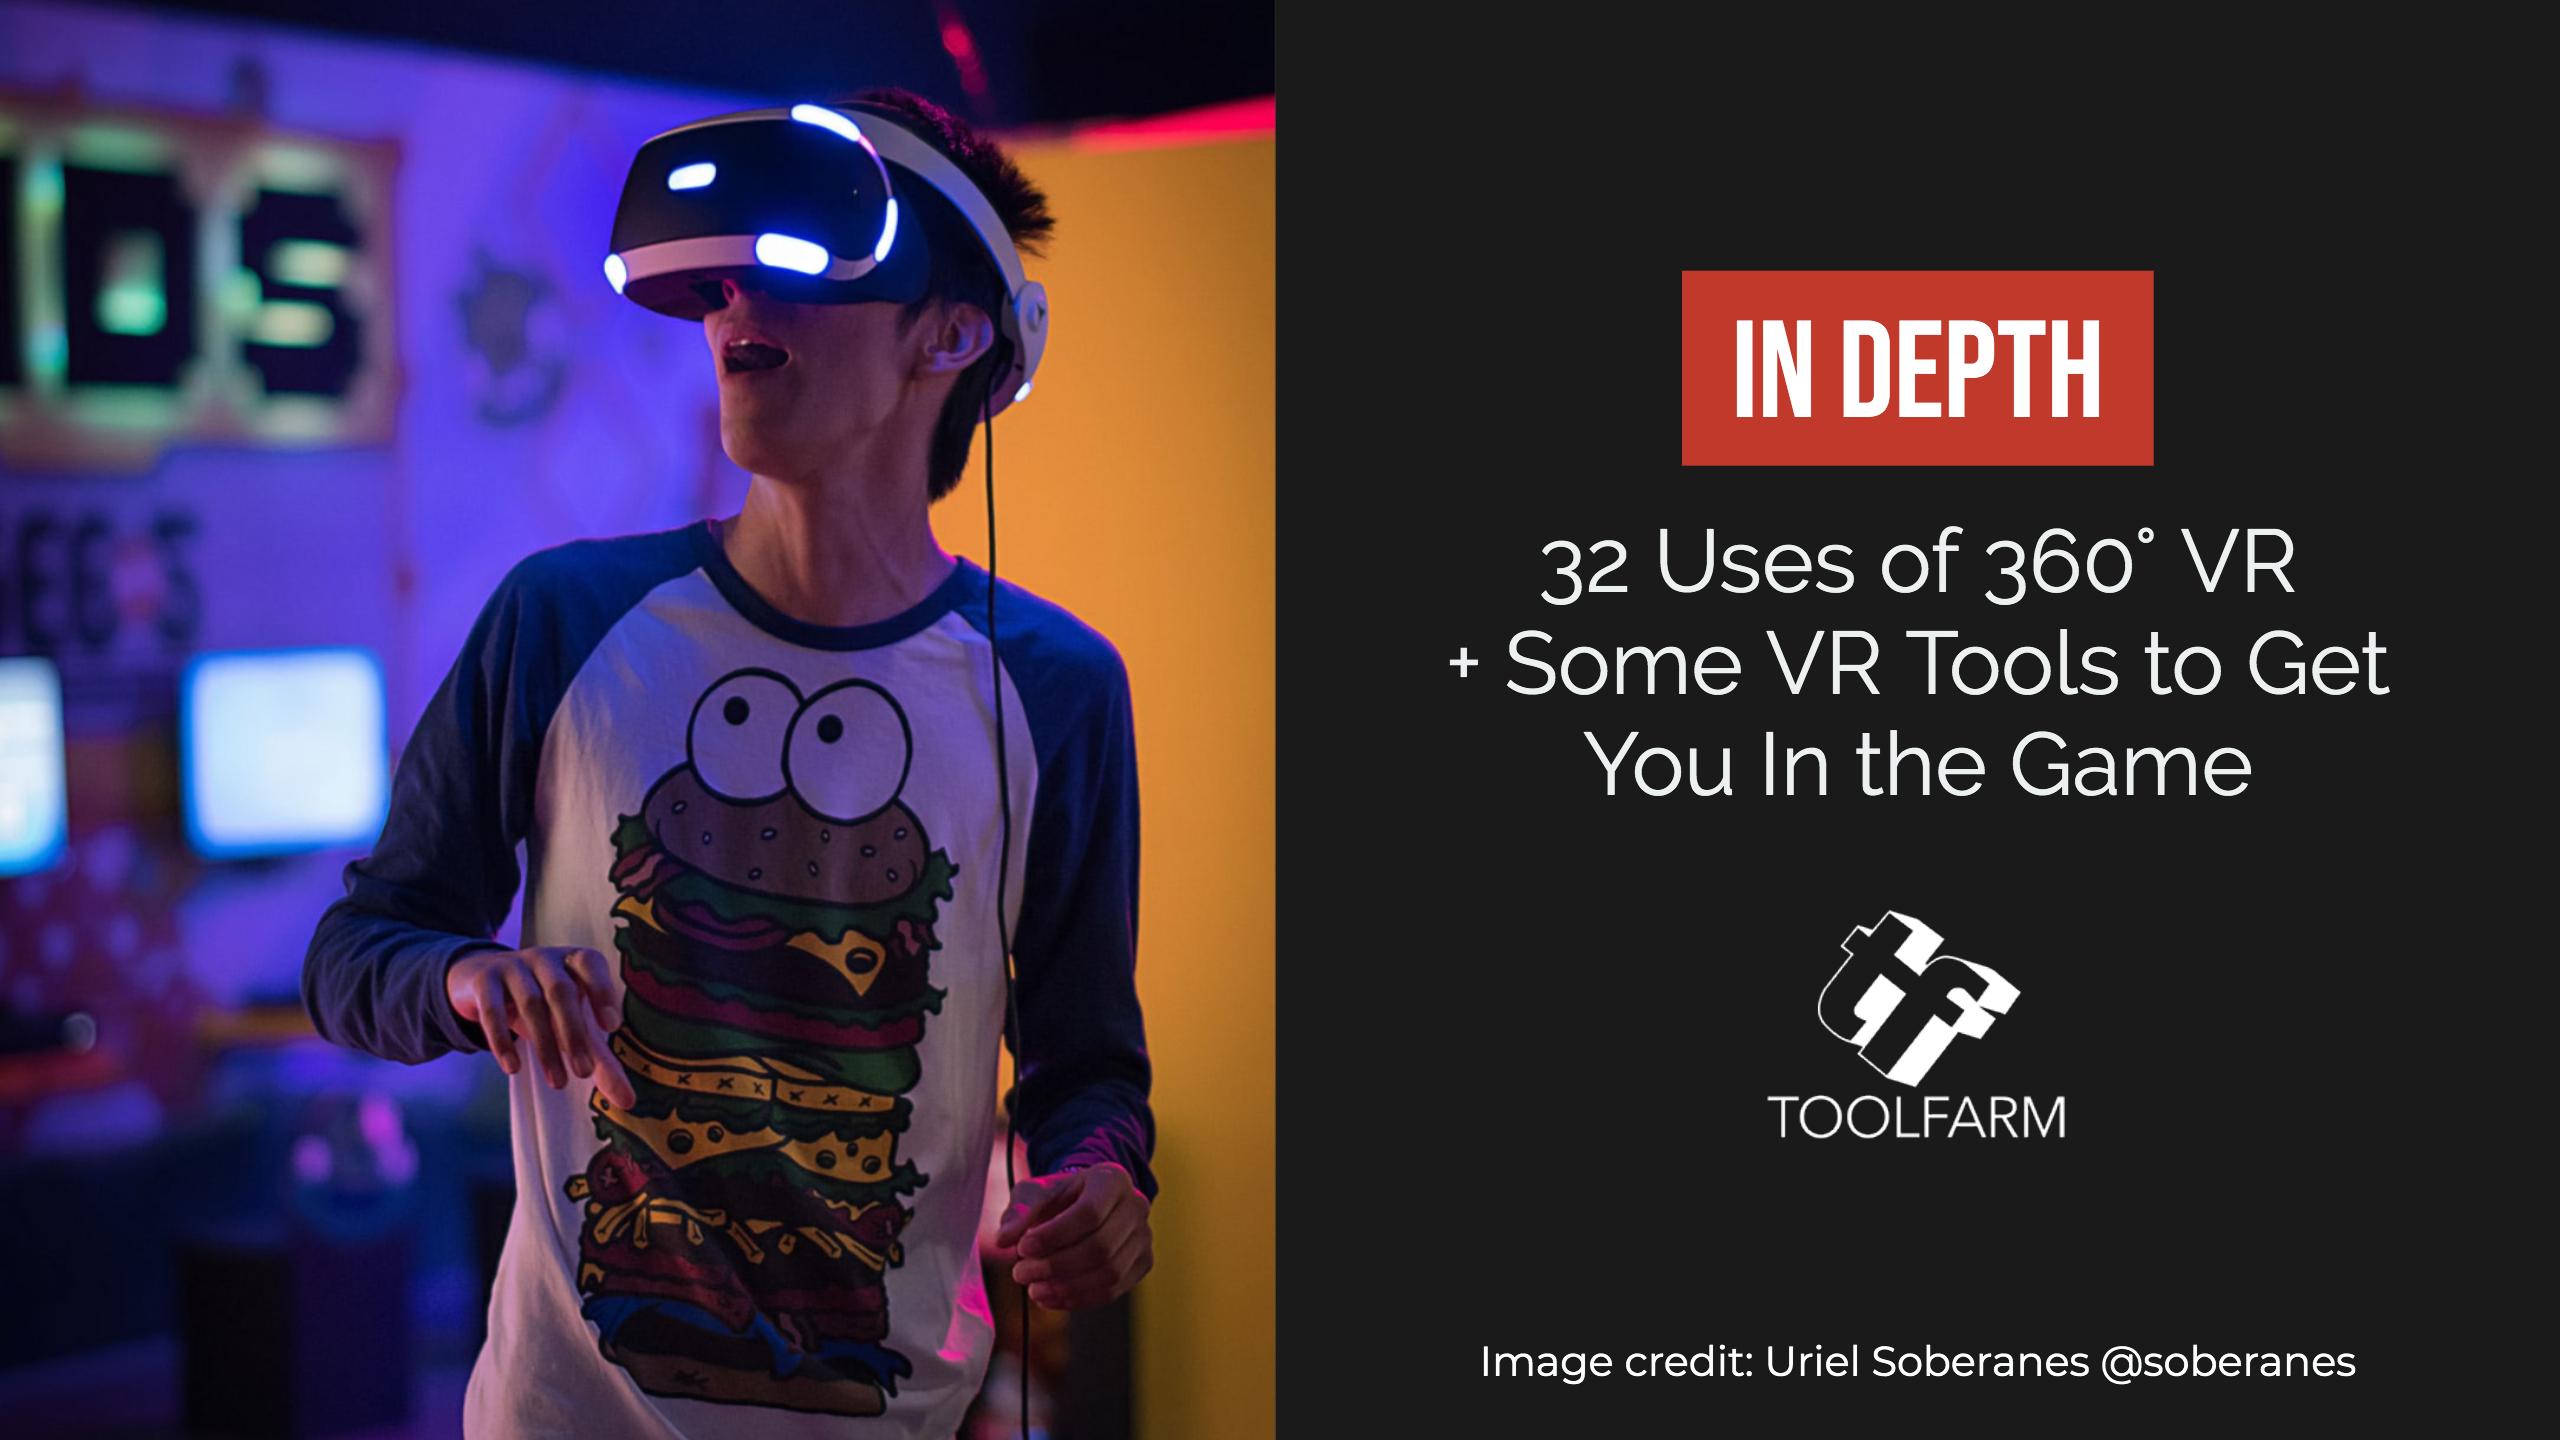 In depth: VR. Image credit: Uriel Soberanes @soberanes